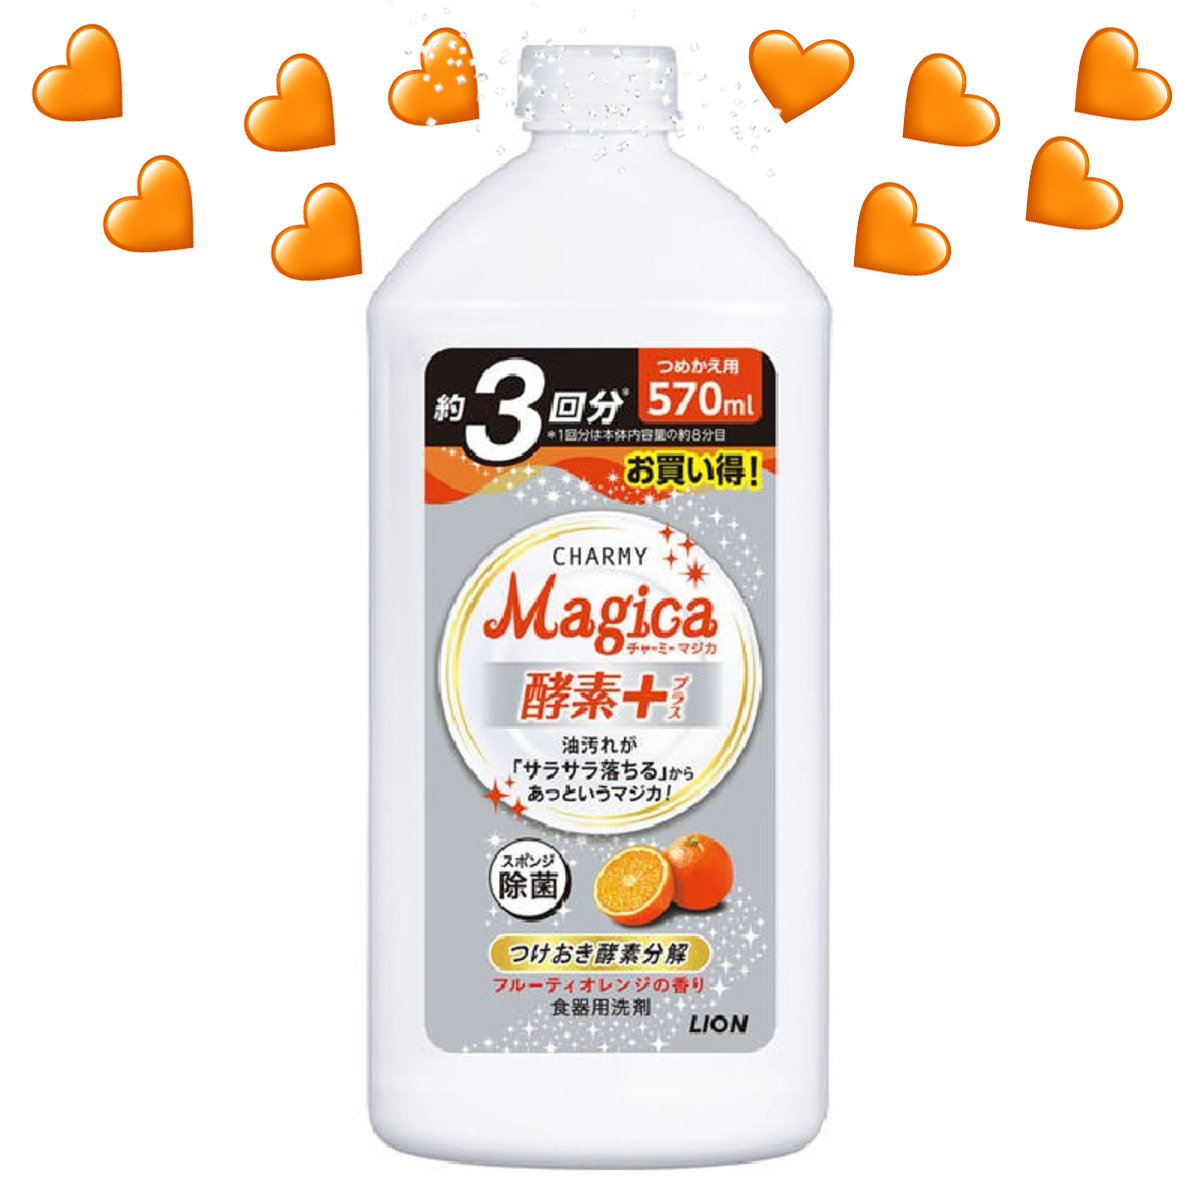 #Tangerine Charmy Magica Enzyme + Sterilized Dishwashing Liquid Refill (Orange) 570ml